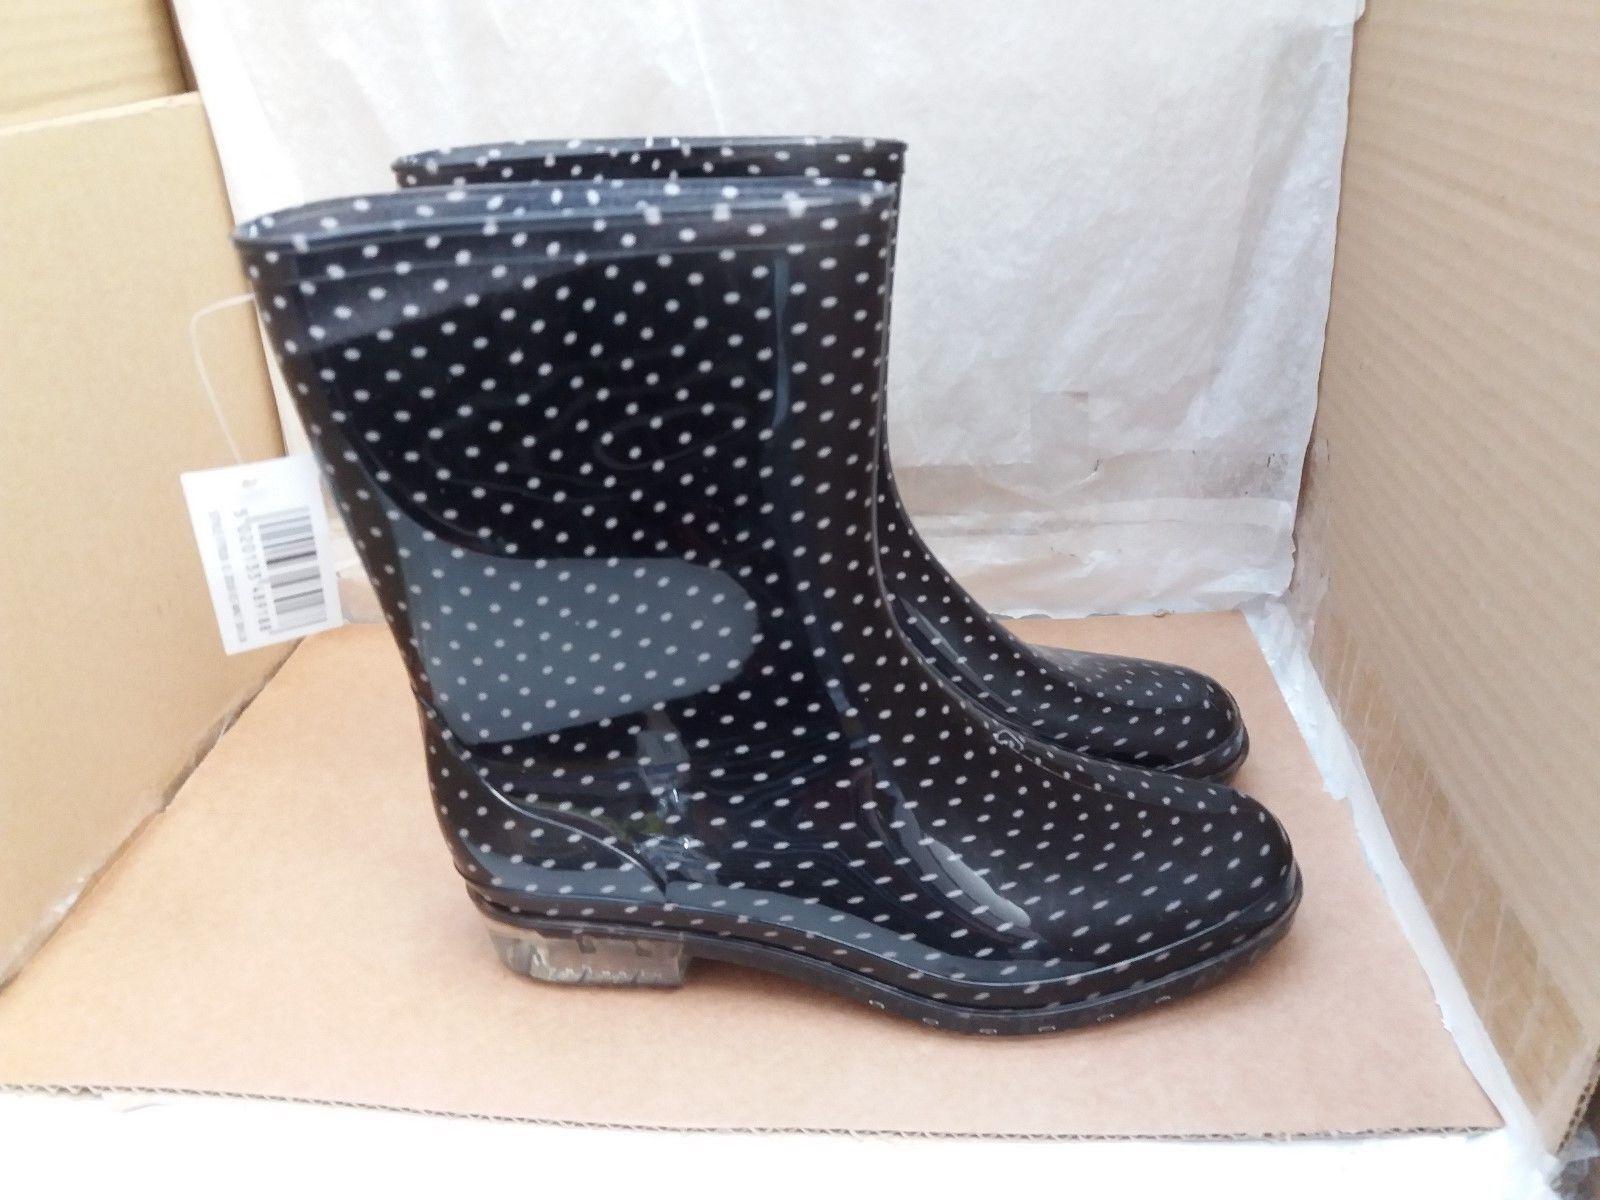 Ladies Short 'Mud Rocks' Fashion Wellington Boots Polka Dot Design FT918 - UK 7